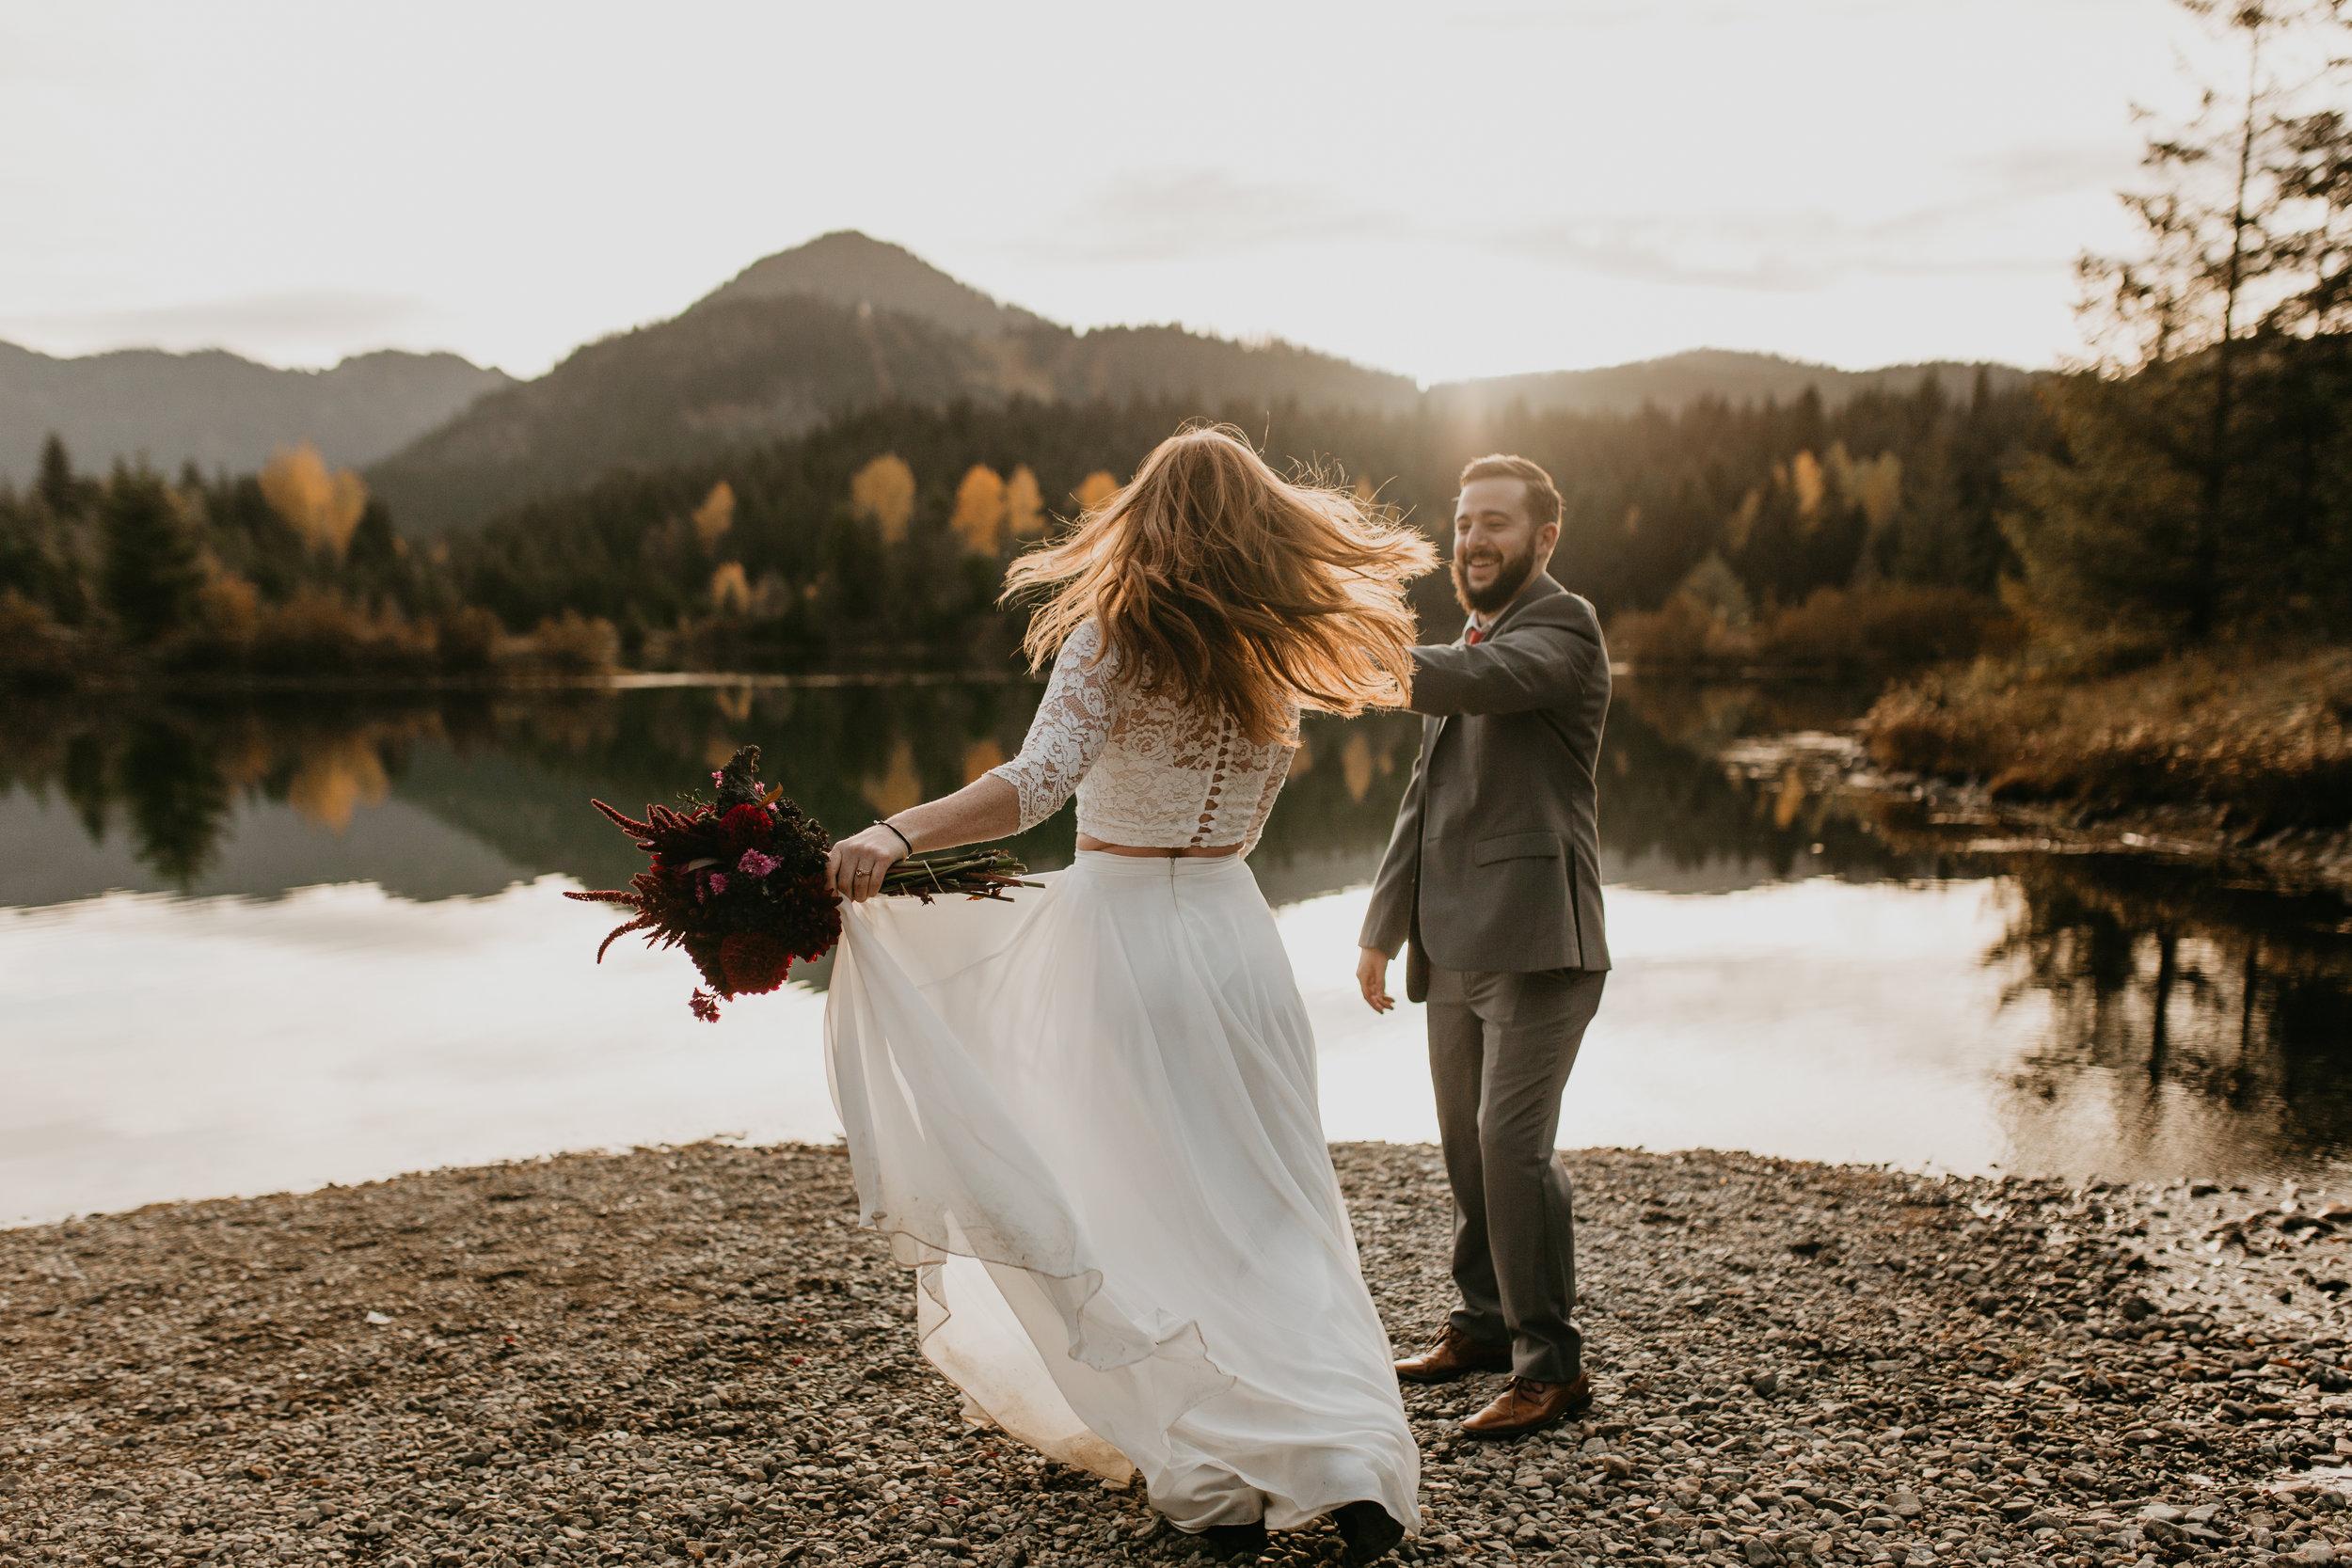 nicole-daacke-photography-mountain-view-elopement-at-gold-creek-pond-snoqualmie-washington-wa-elopement-photographer-photography-adventure-elopement-in-washington-fall-lakeside-golden-sunset-boho-fun-bride-0405.jpg